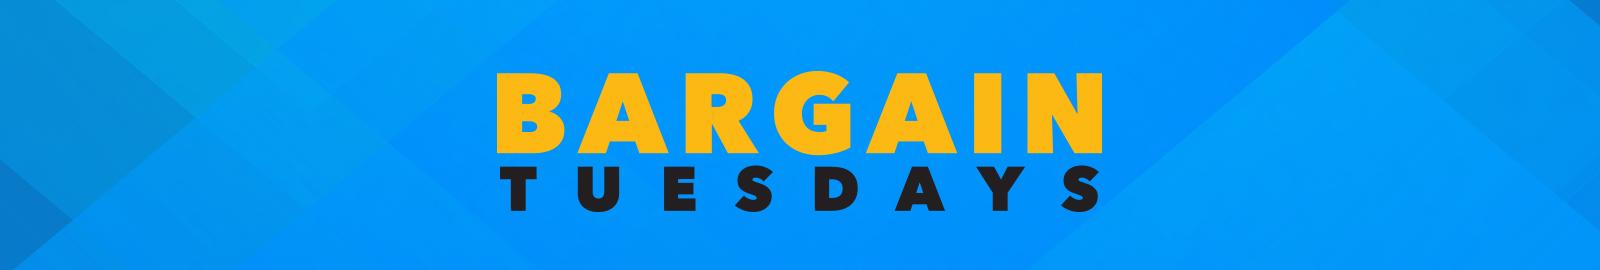 Bargain Tuesday Header